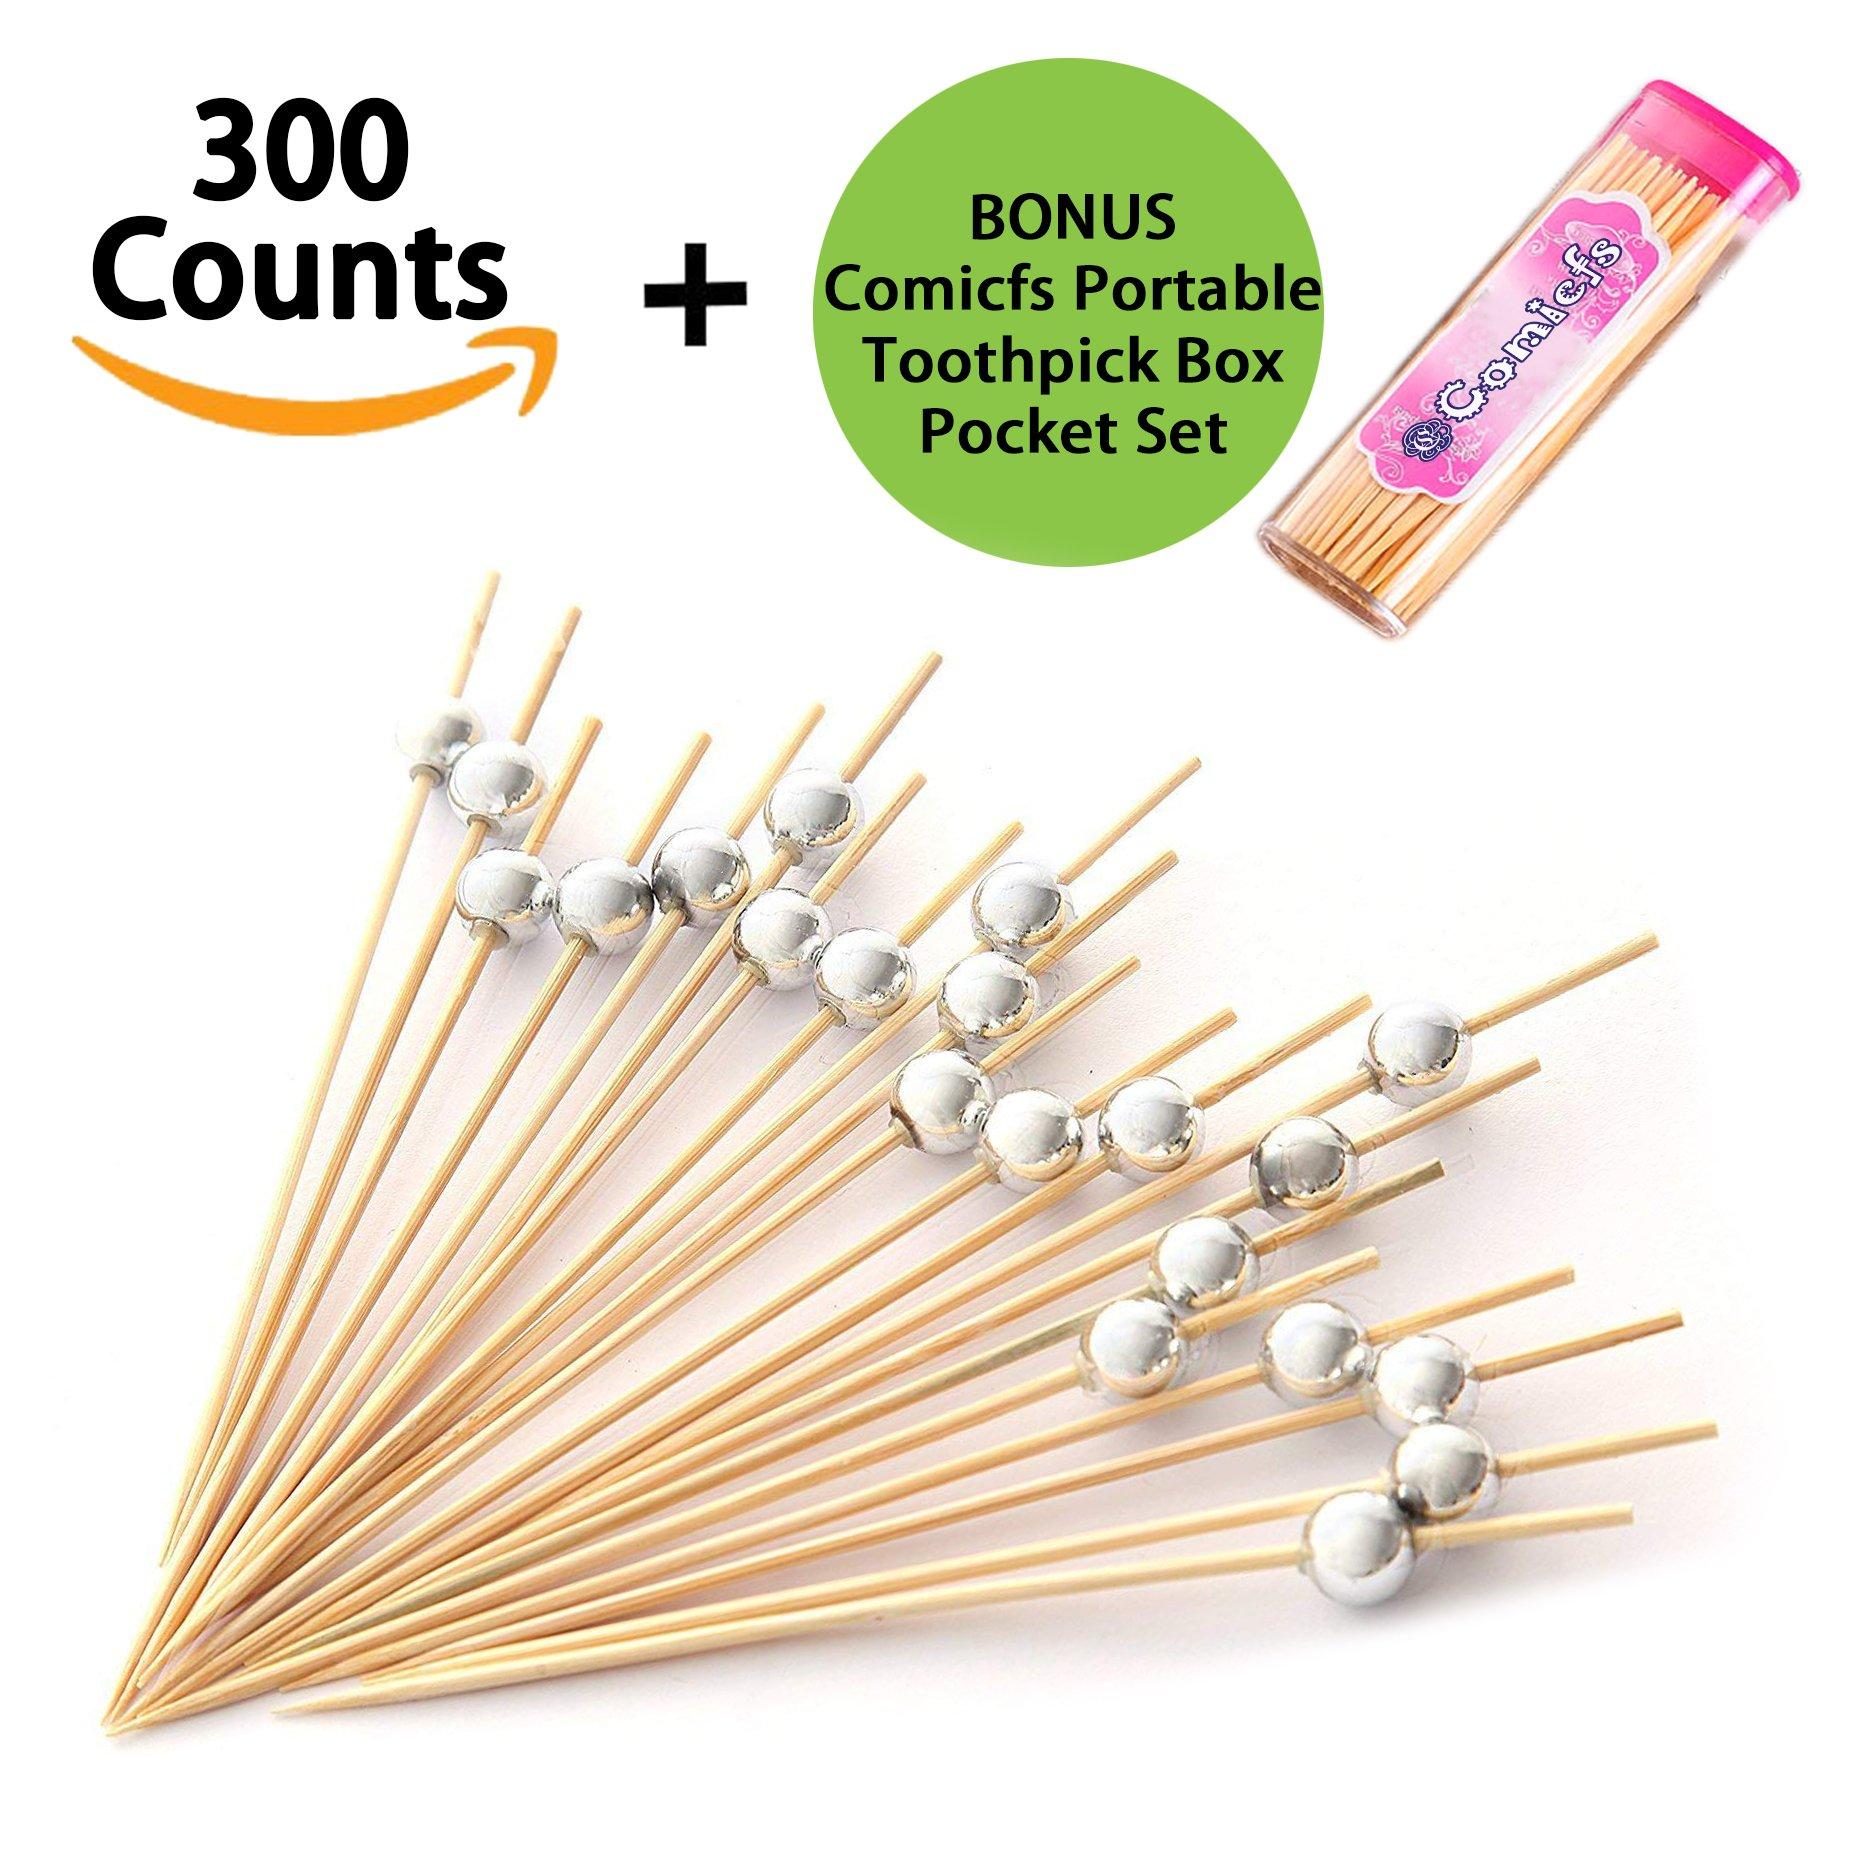 Comicfs Cocktail Picks Handmade Bamboo Toothpicks 4.7'' Party Supplies 300 Counts BONUS Comicfs Portable Toothpick Box Pocket Set, Silver Pearl - 31A